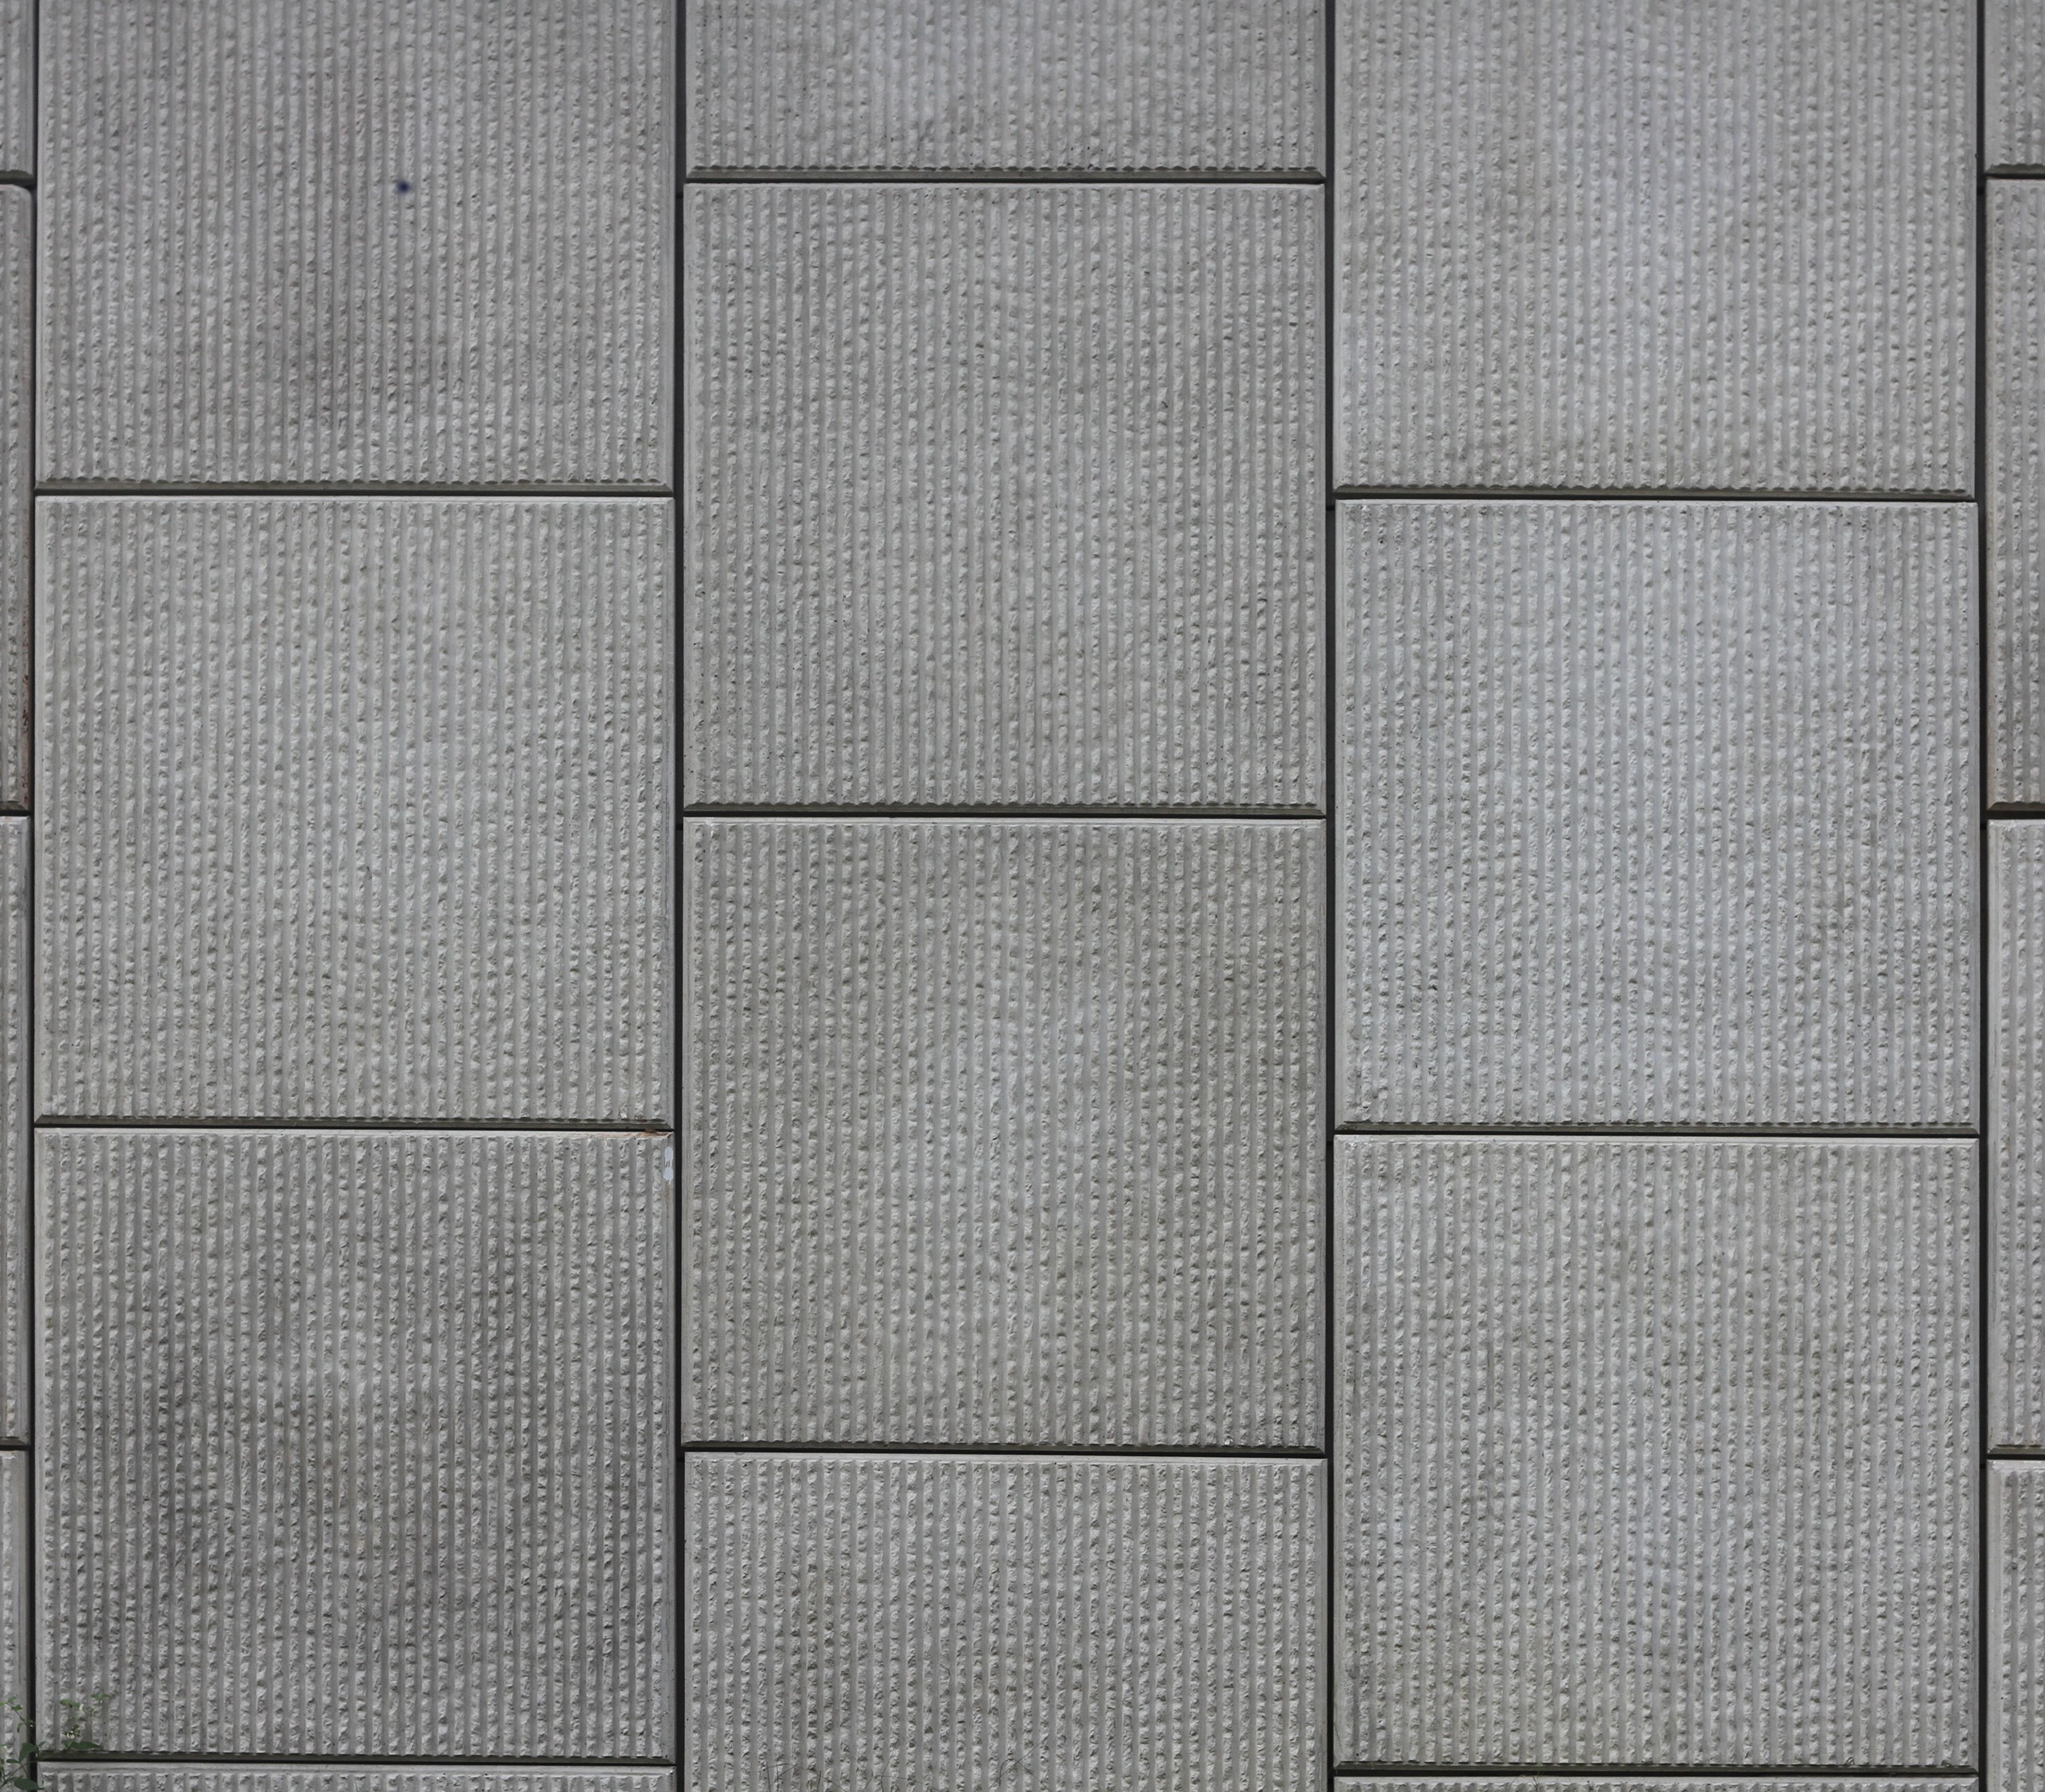 Concrete Retaining Wall Textures 14textures Texture